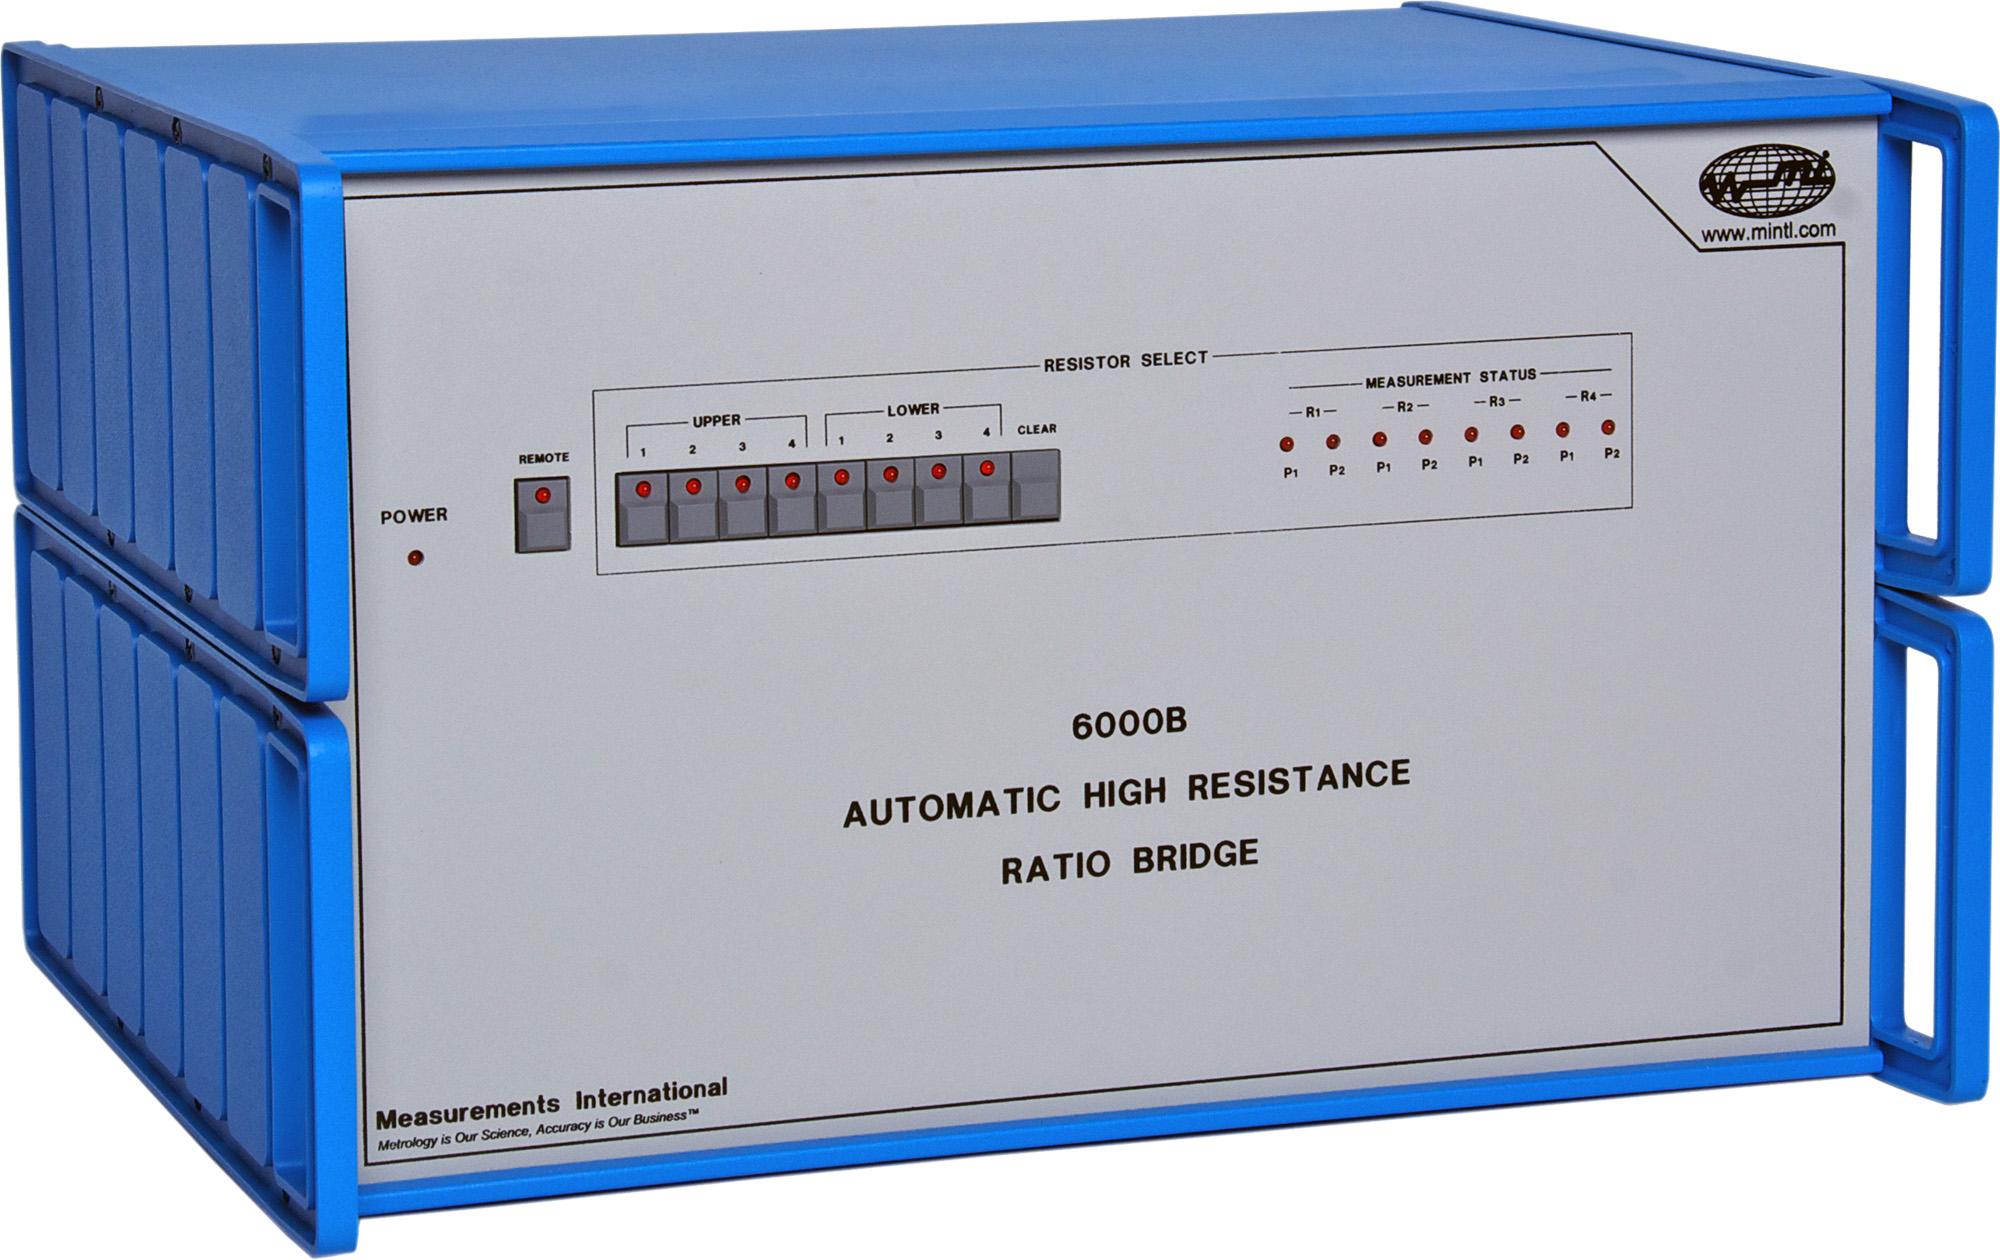 6000B AccuBridge Automatic High Resistance Ratio Bridge